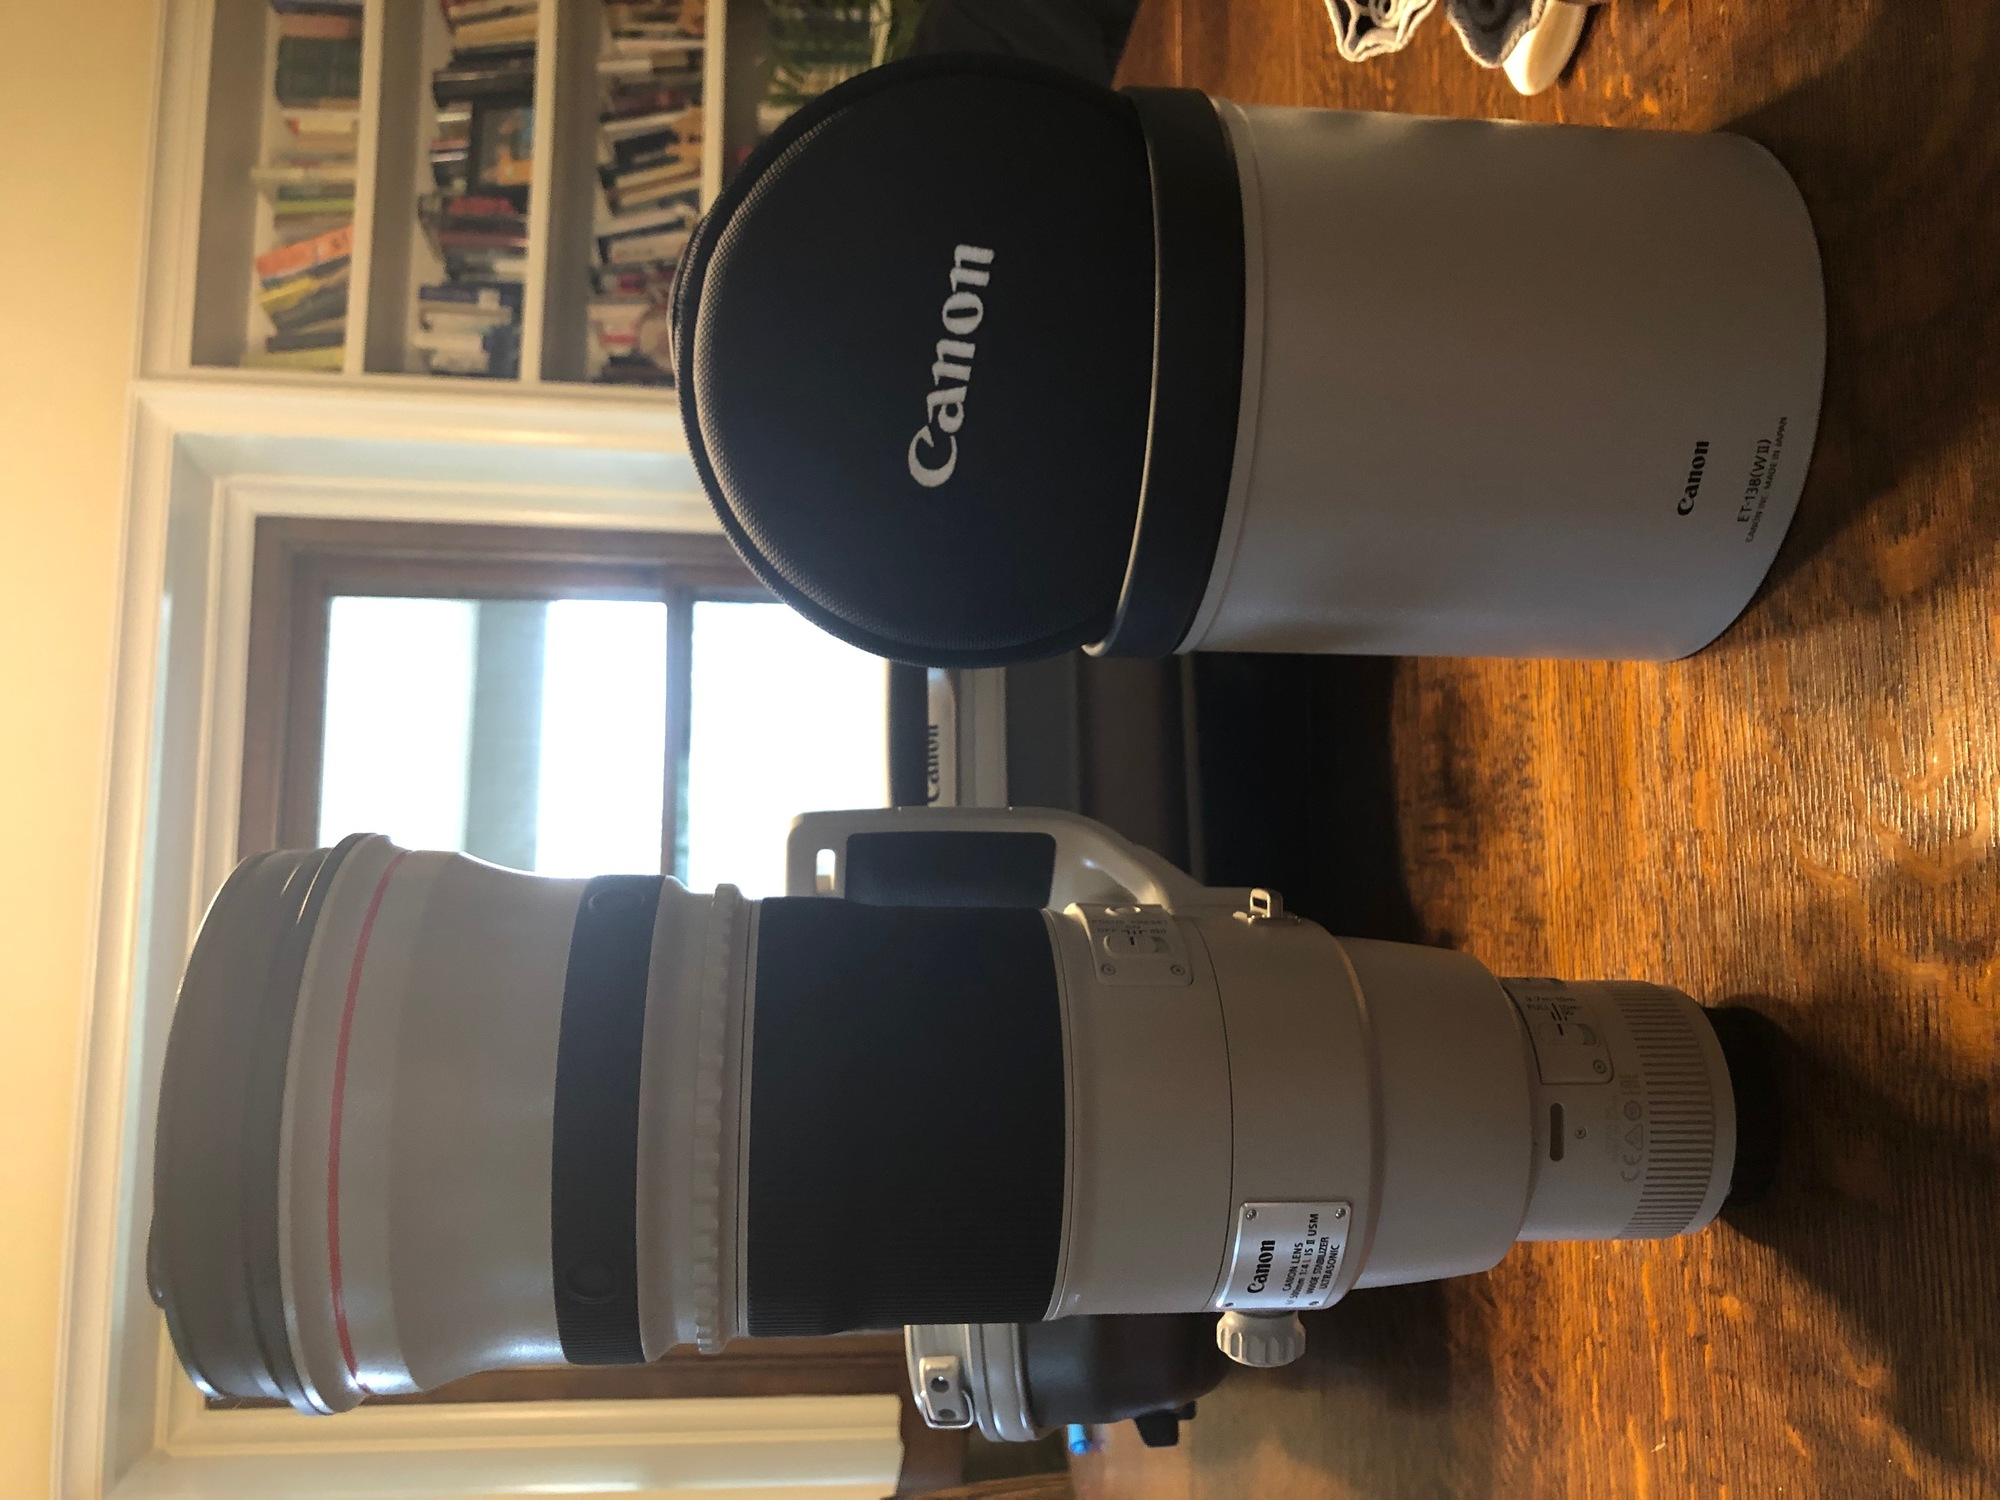 Don Zeck Lens Cap for Canon 500mm f//4.0 USM IS Lens